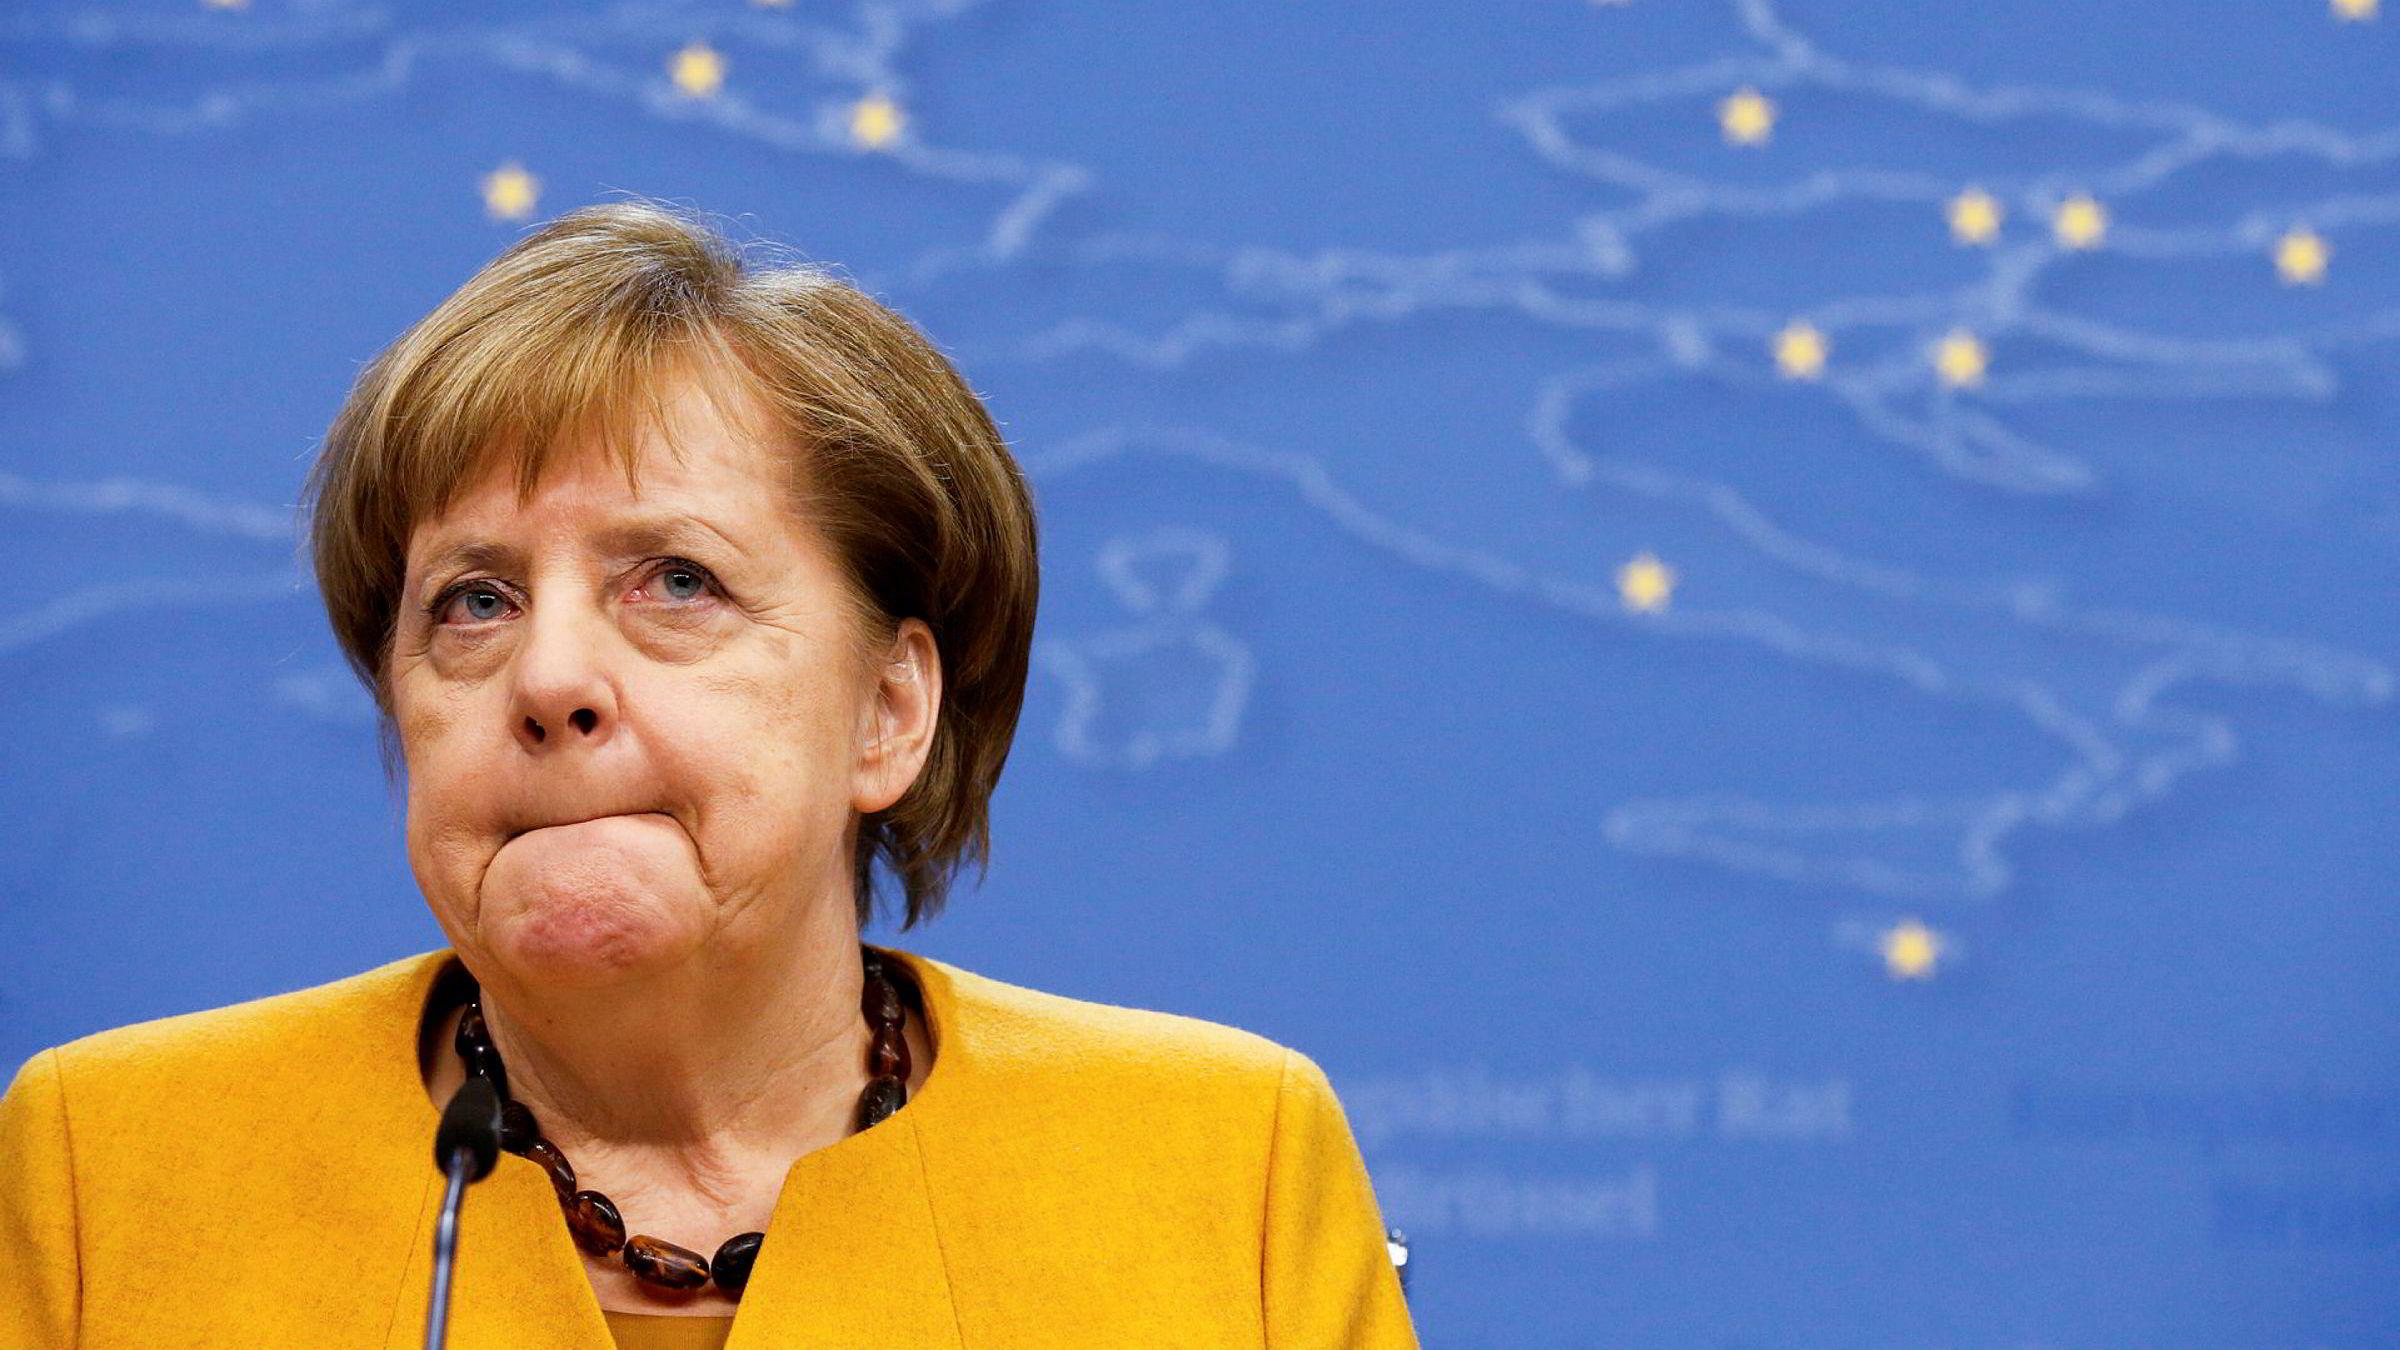 Tysklands statsminister, Angela Merkel, sier Russland er involvert i hackerangrep mot Forbundsdagen.